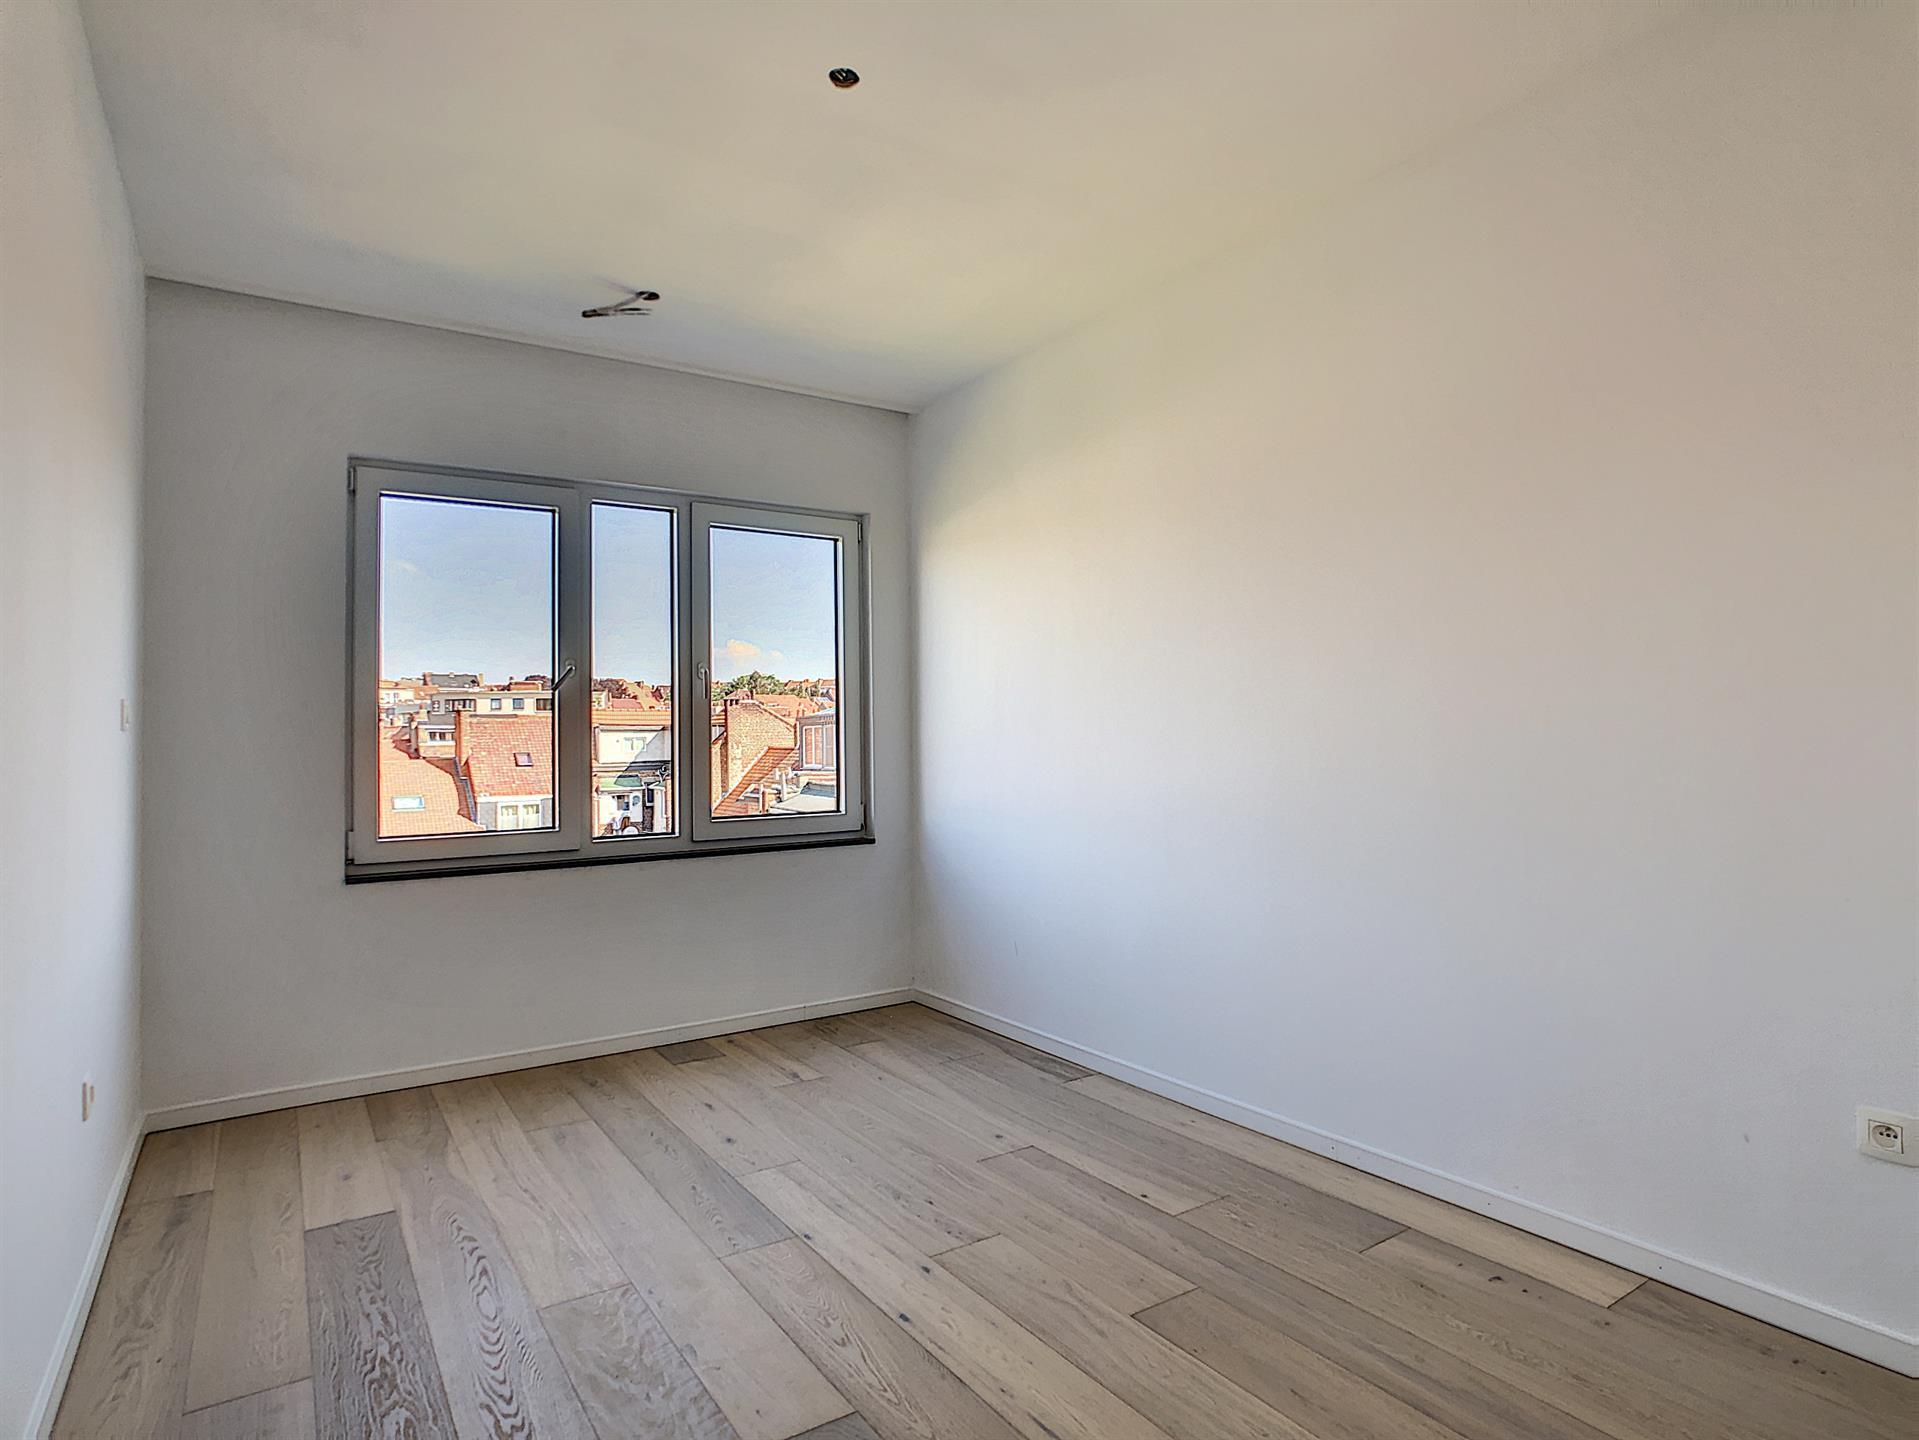 Appartement - Anderlecht - #4252385-20